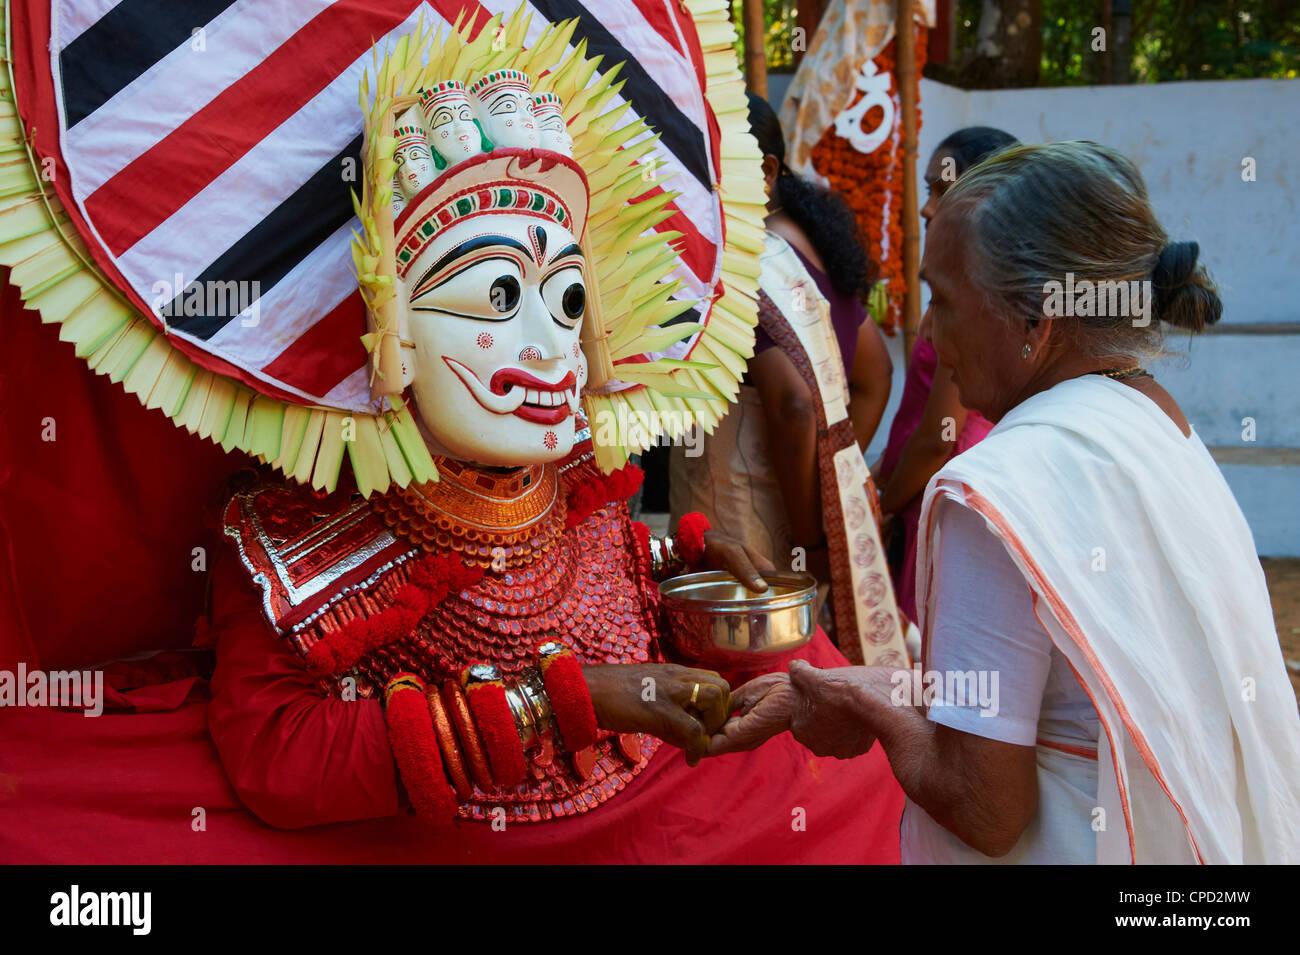 Representación de un dios hindú, Teyyam ceremonia, cerca de Kannur, en Kerala, India, Asia Foto de stock